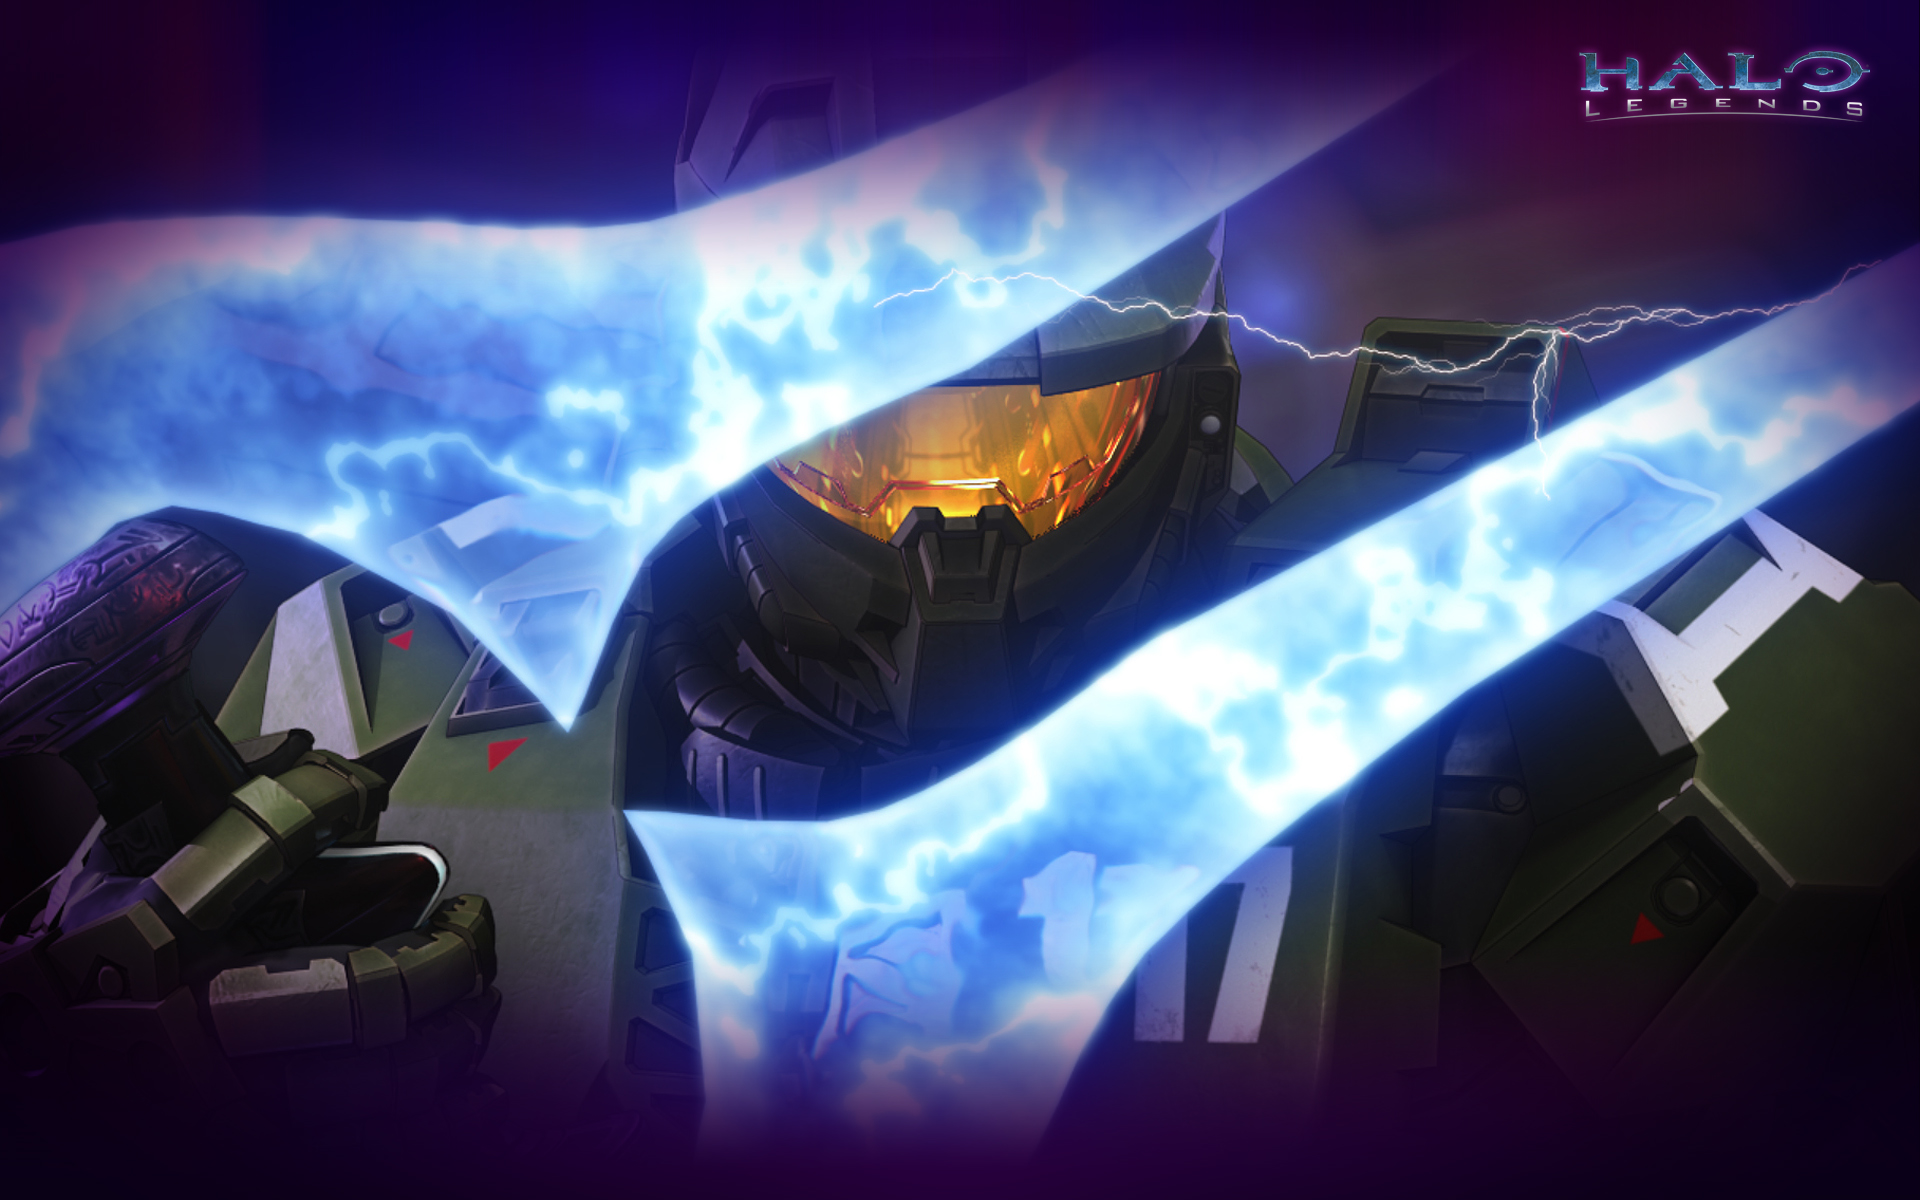 Halo Legends Wallpaper